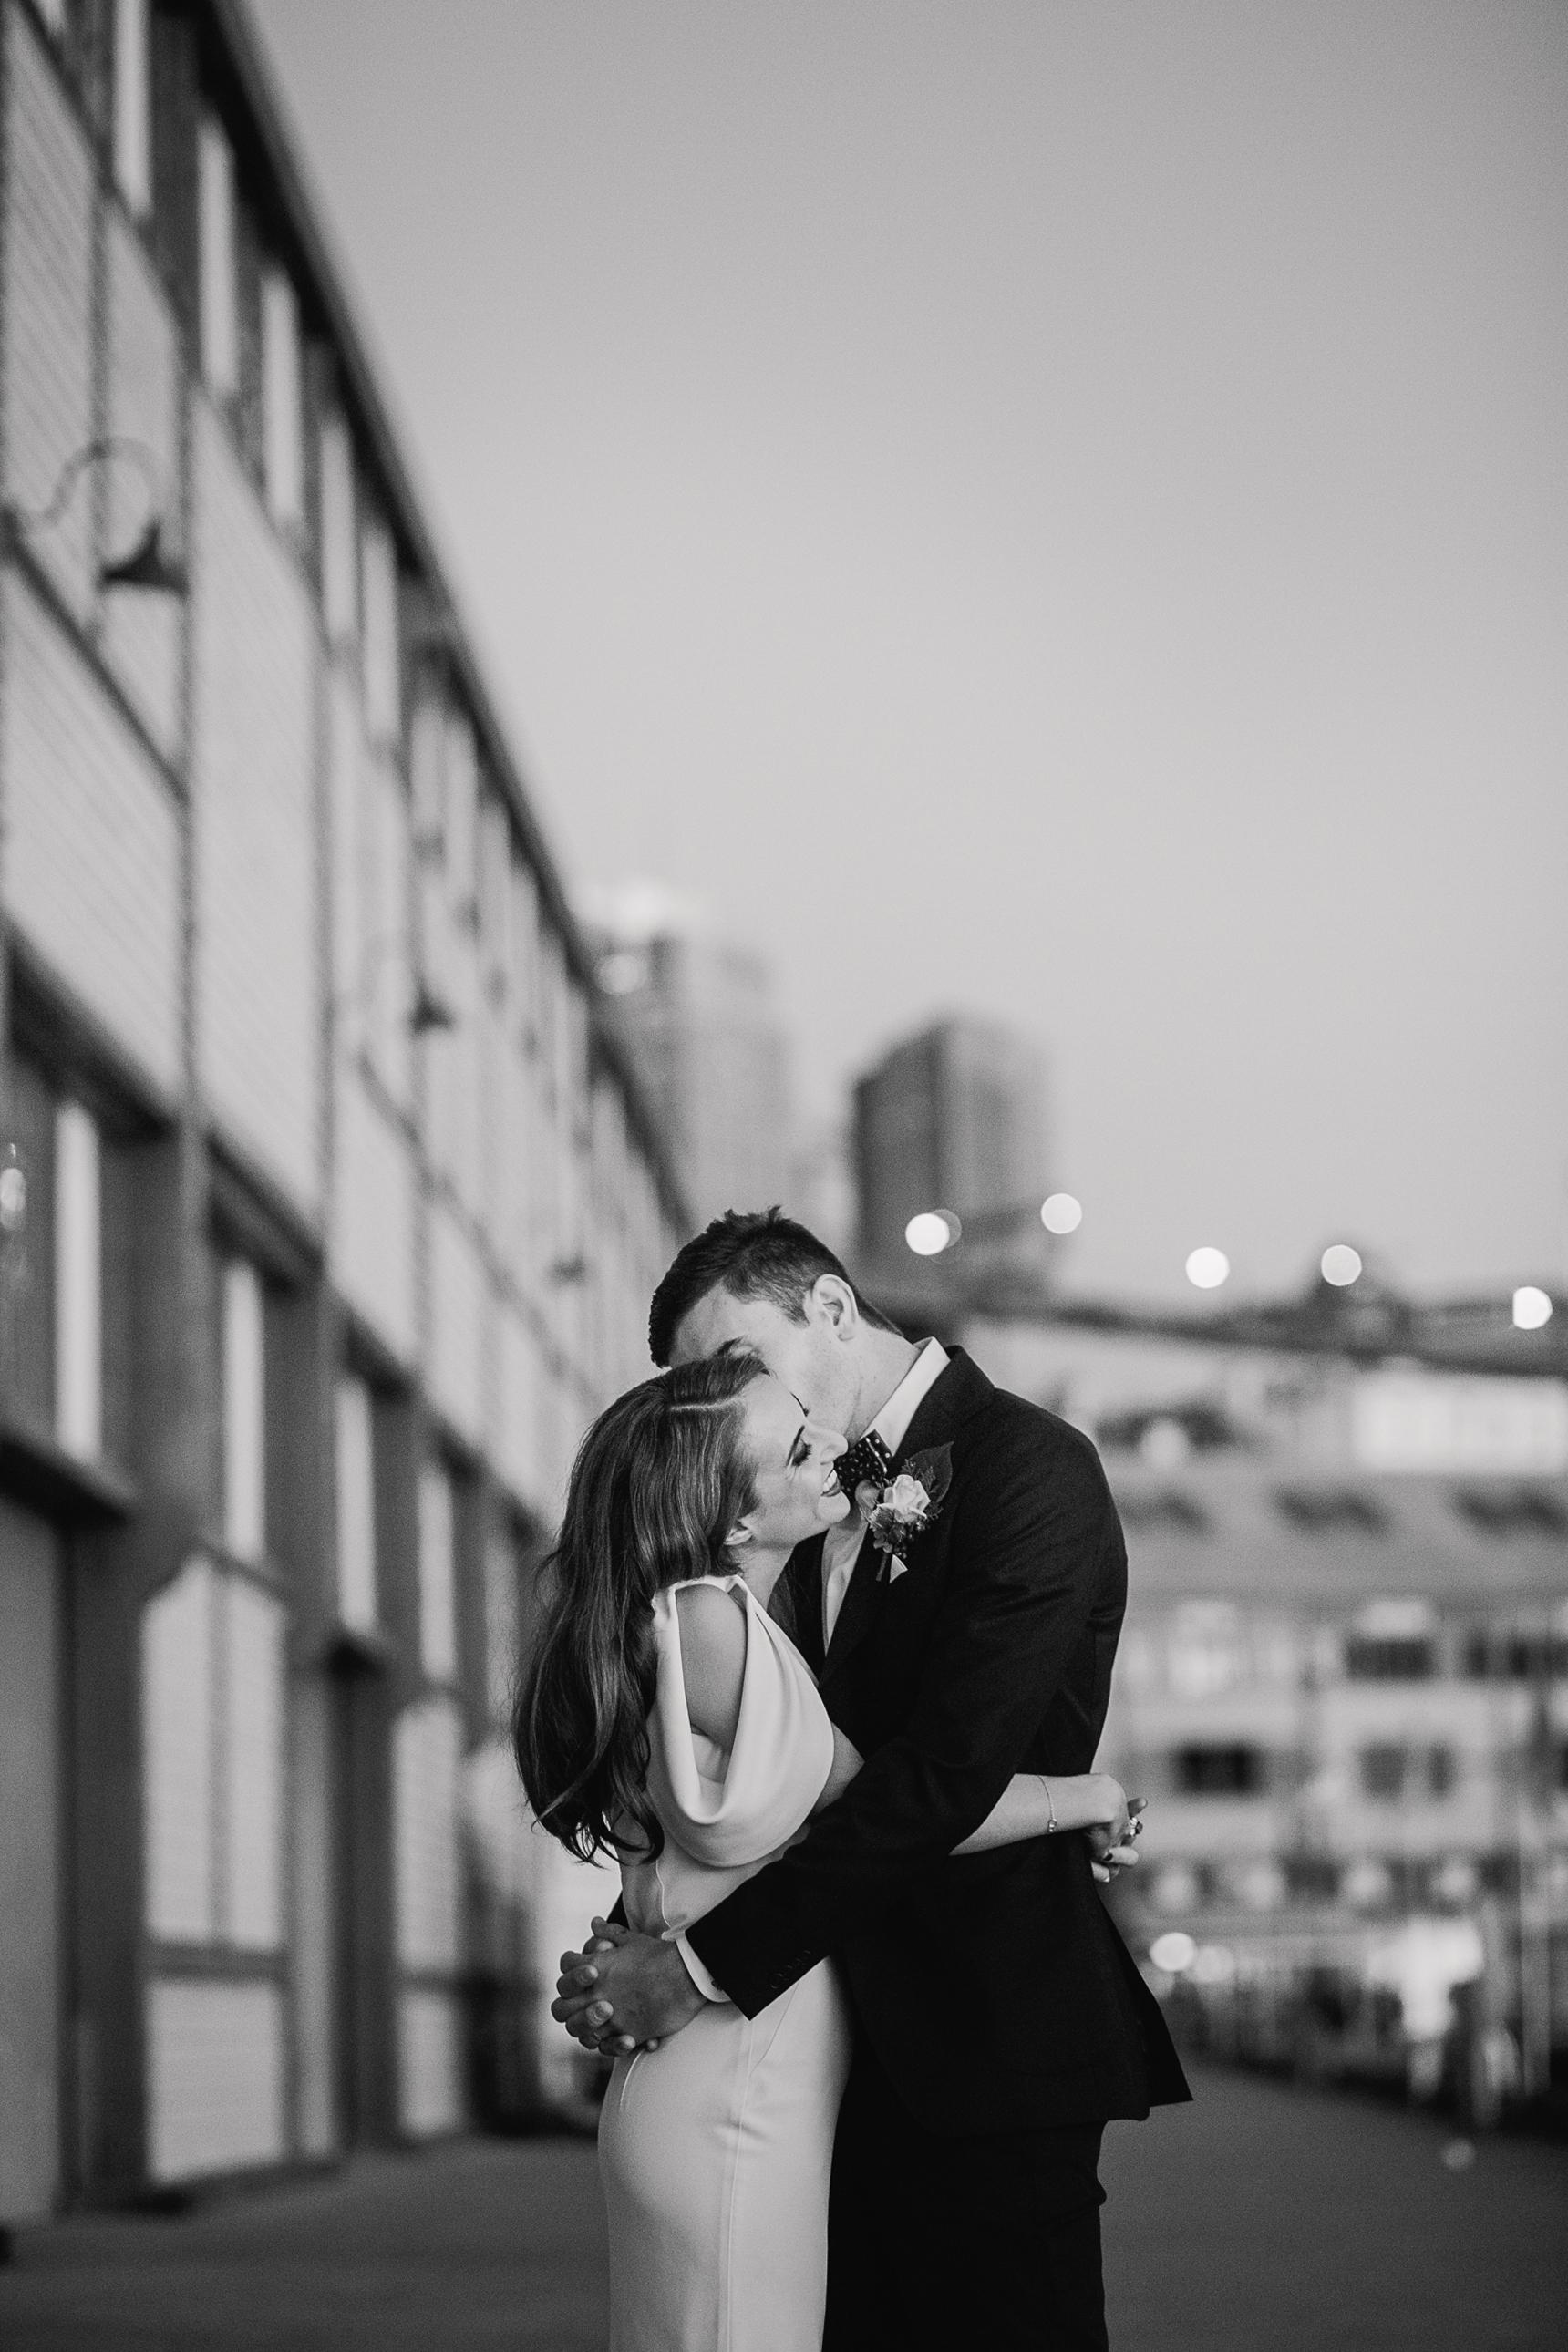 GregLana_ViewBySydney_WeddingPhotography069.jpg